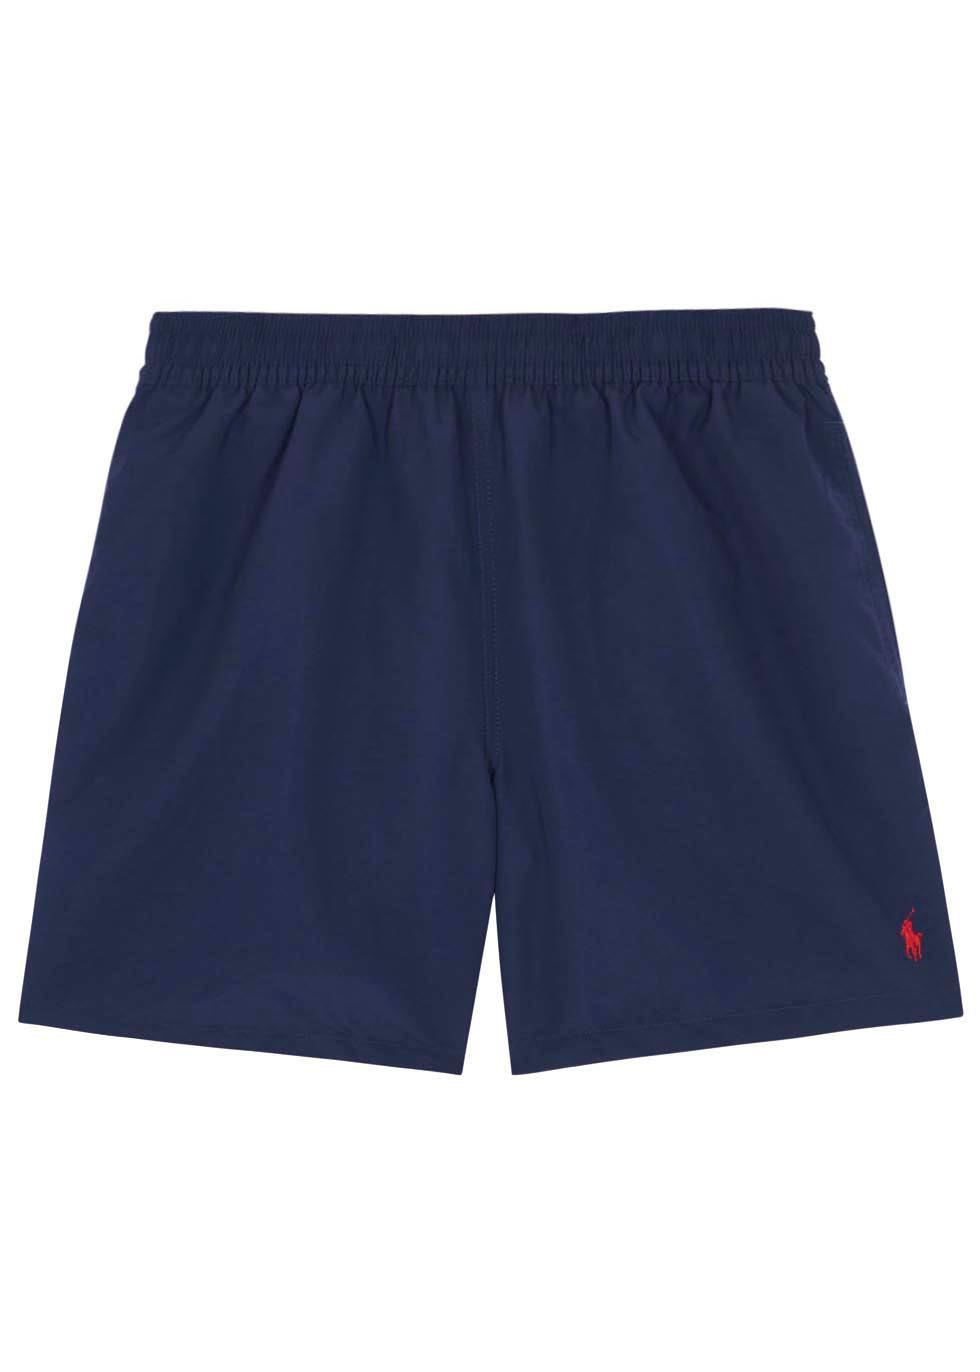 Hawaiian navy swim shorts - Polo Ralph Lauren